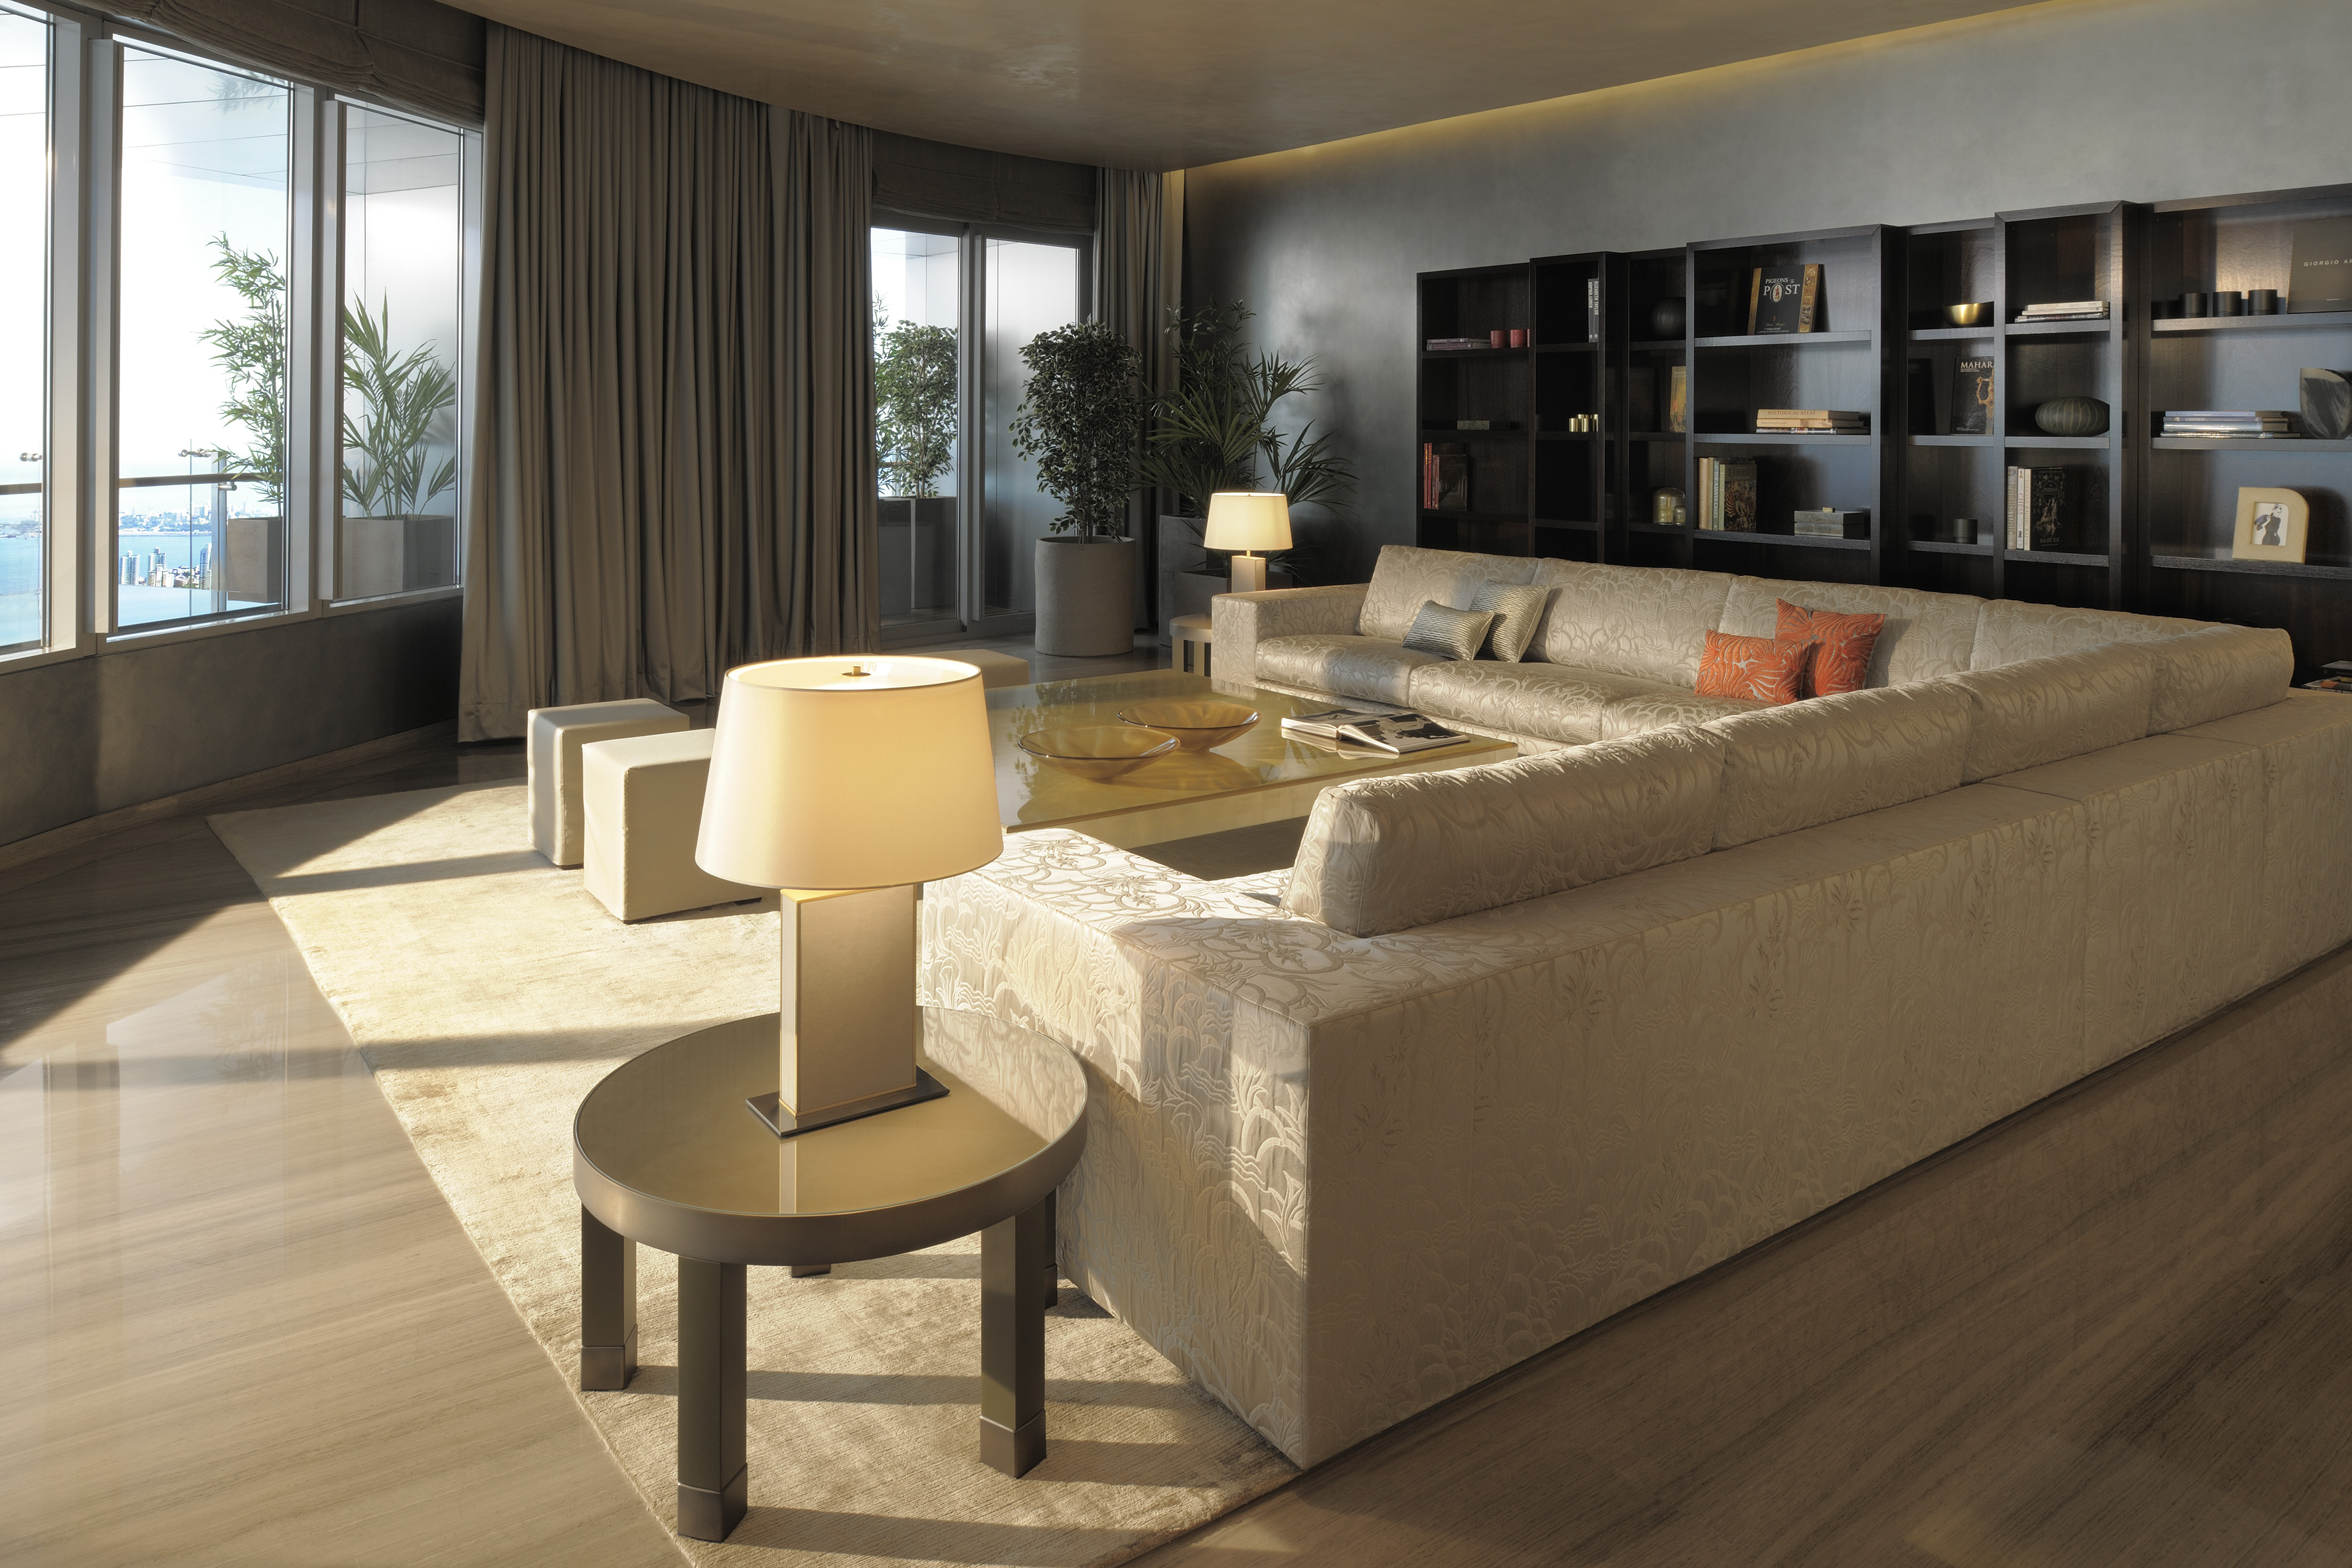 Armani Casa Atribute To 40 Years Of Giorgio Armani